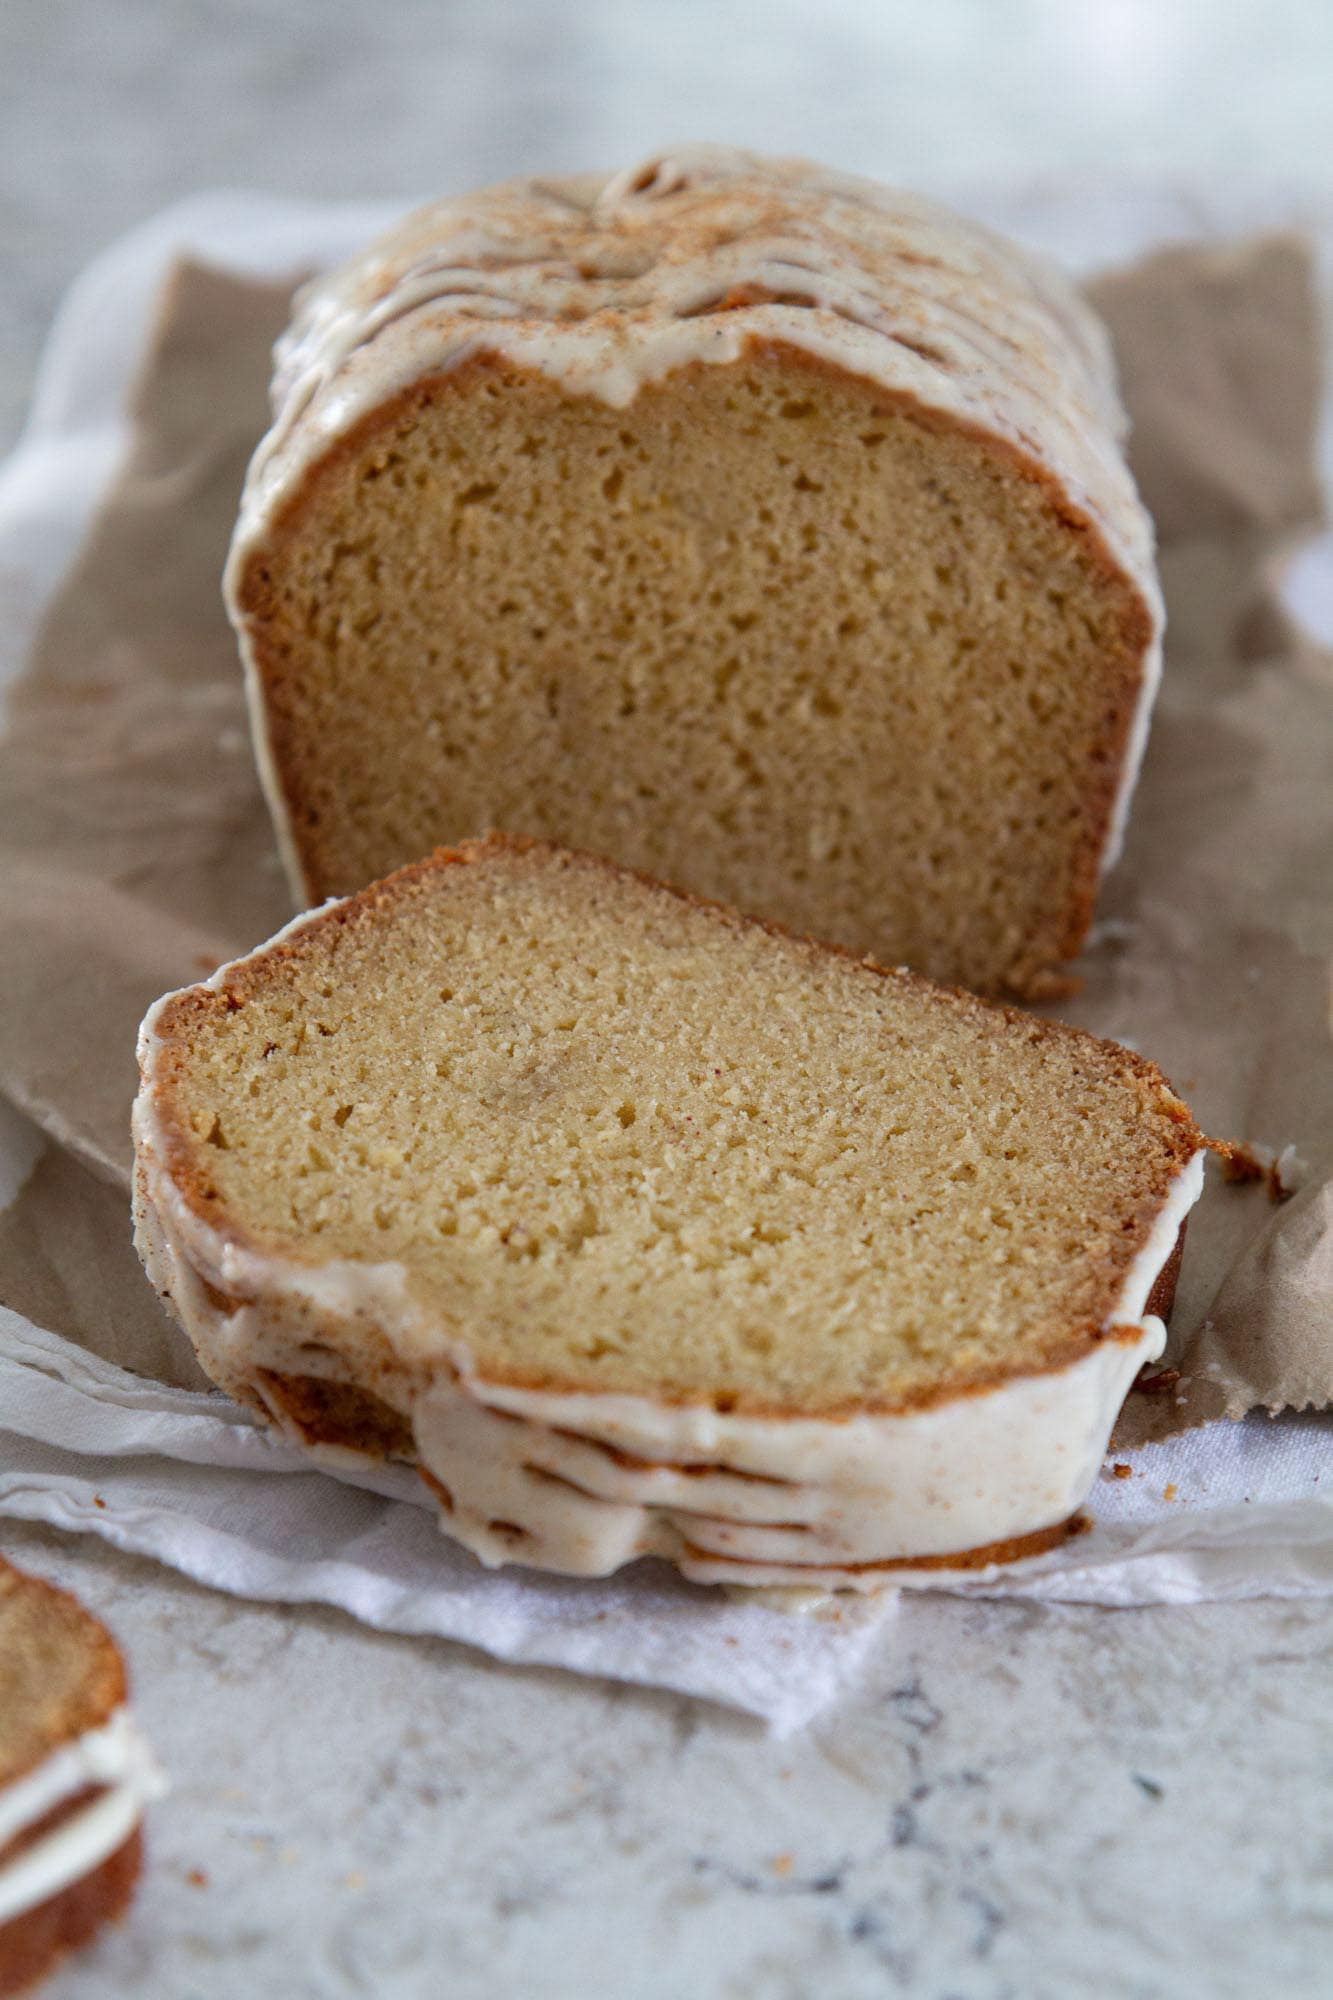 sliced eggnog bread with spiced rum glaze